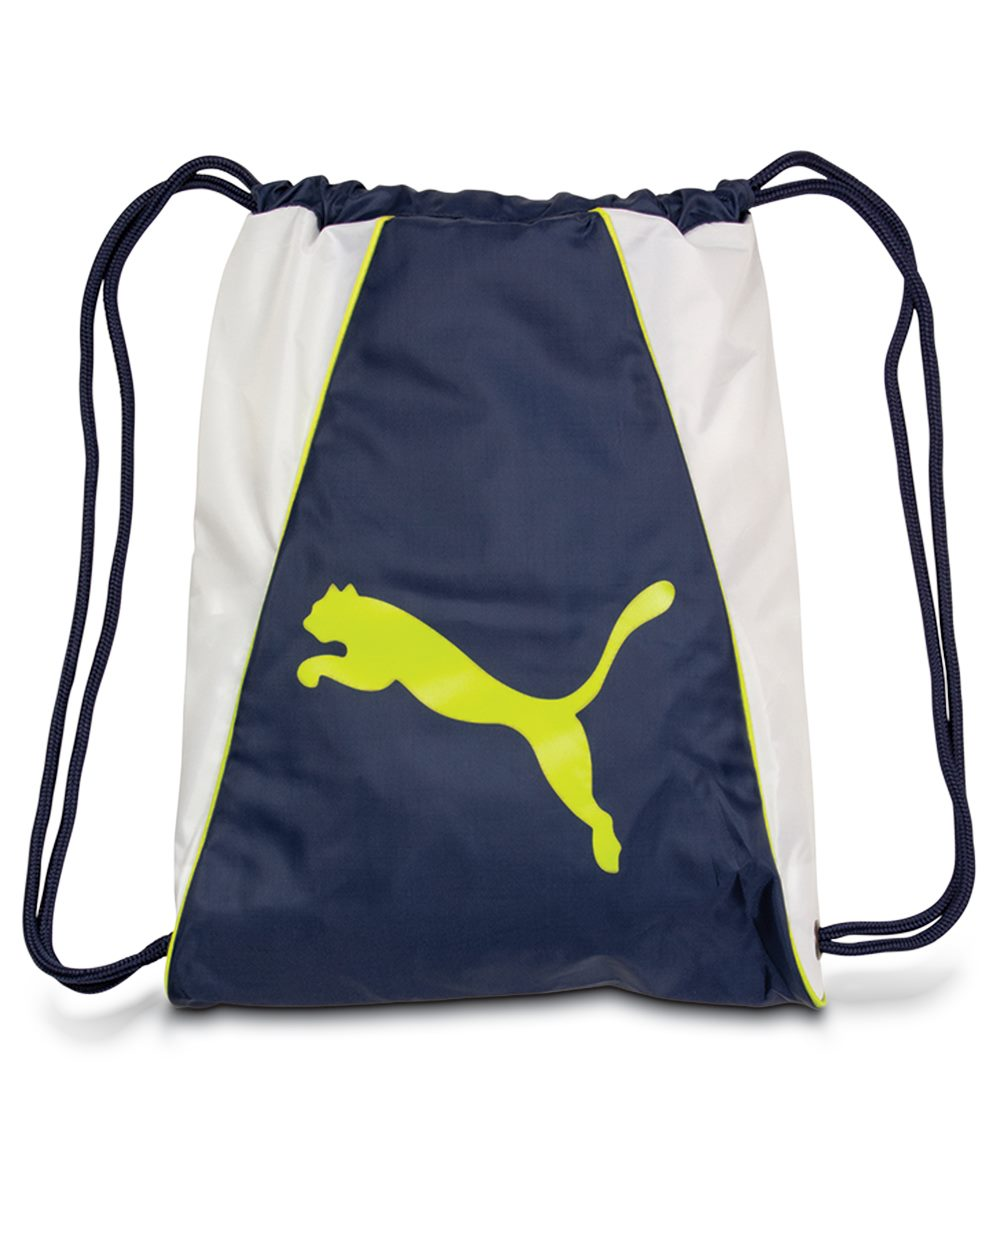 PUMA PSC1007 - Cat Carrysack